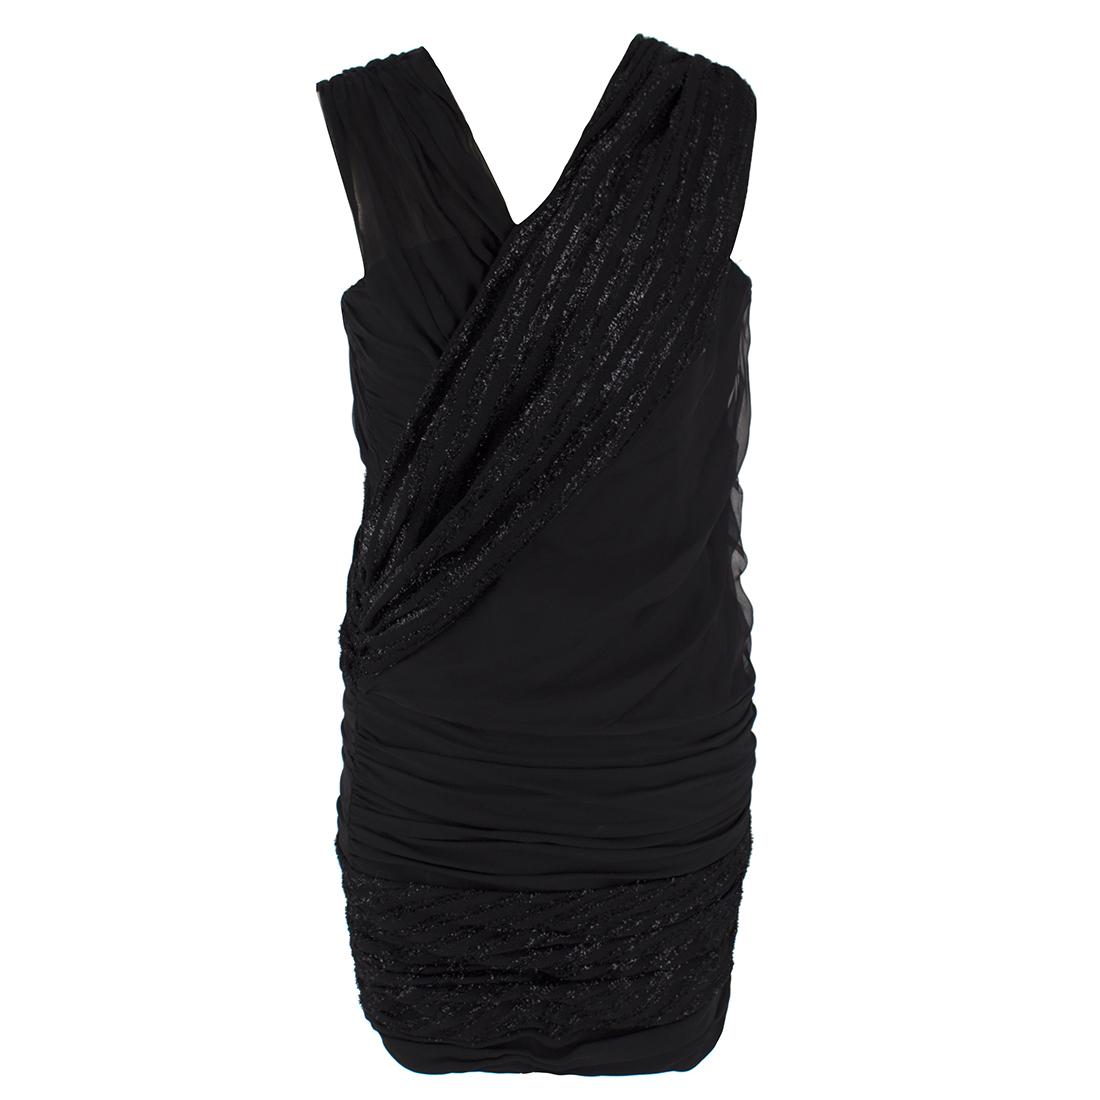 Jay Ahr Black Ruched One-shoulder Mini Dress